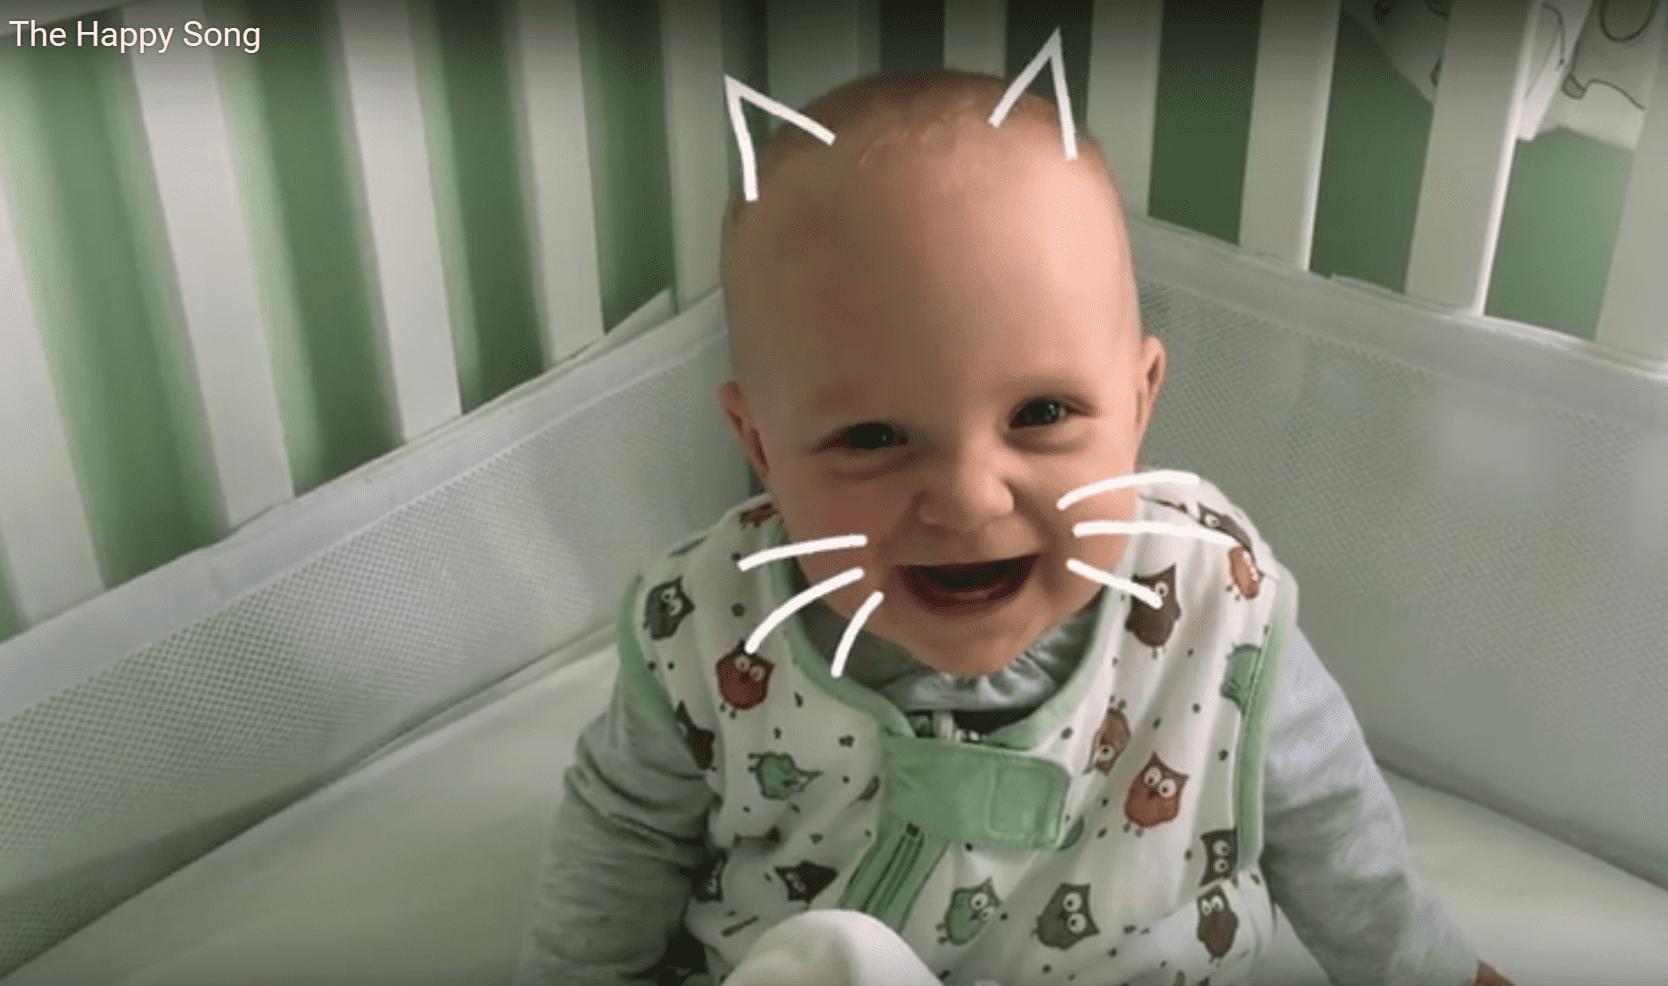 muziek die baby doet lachen